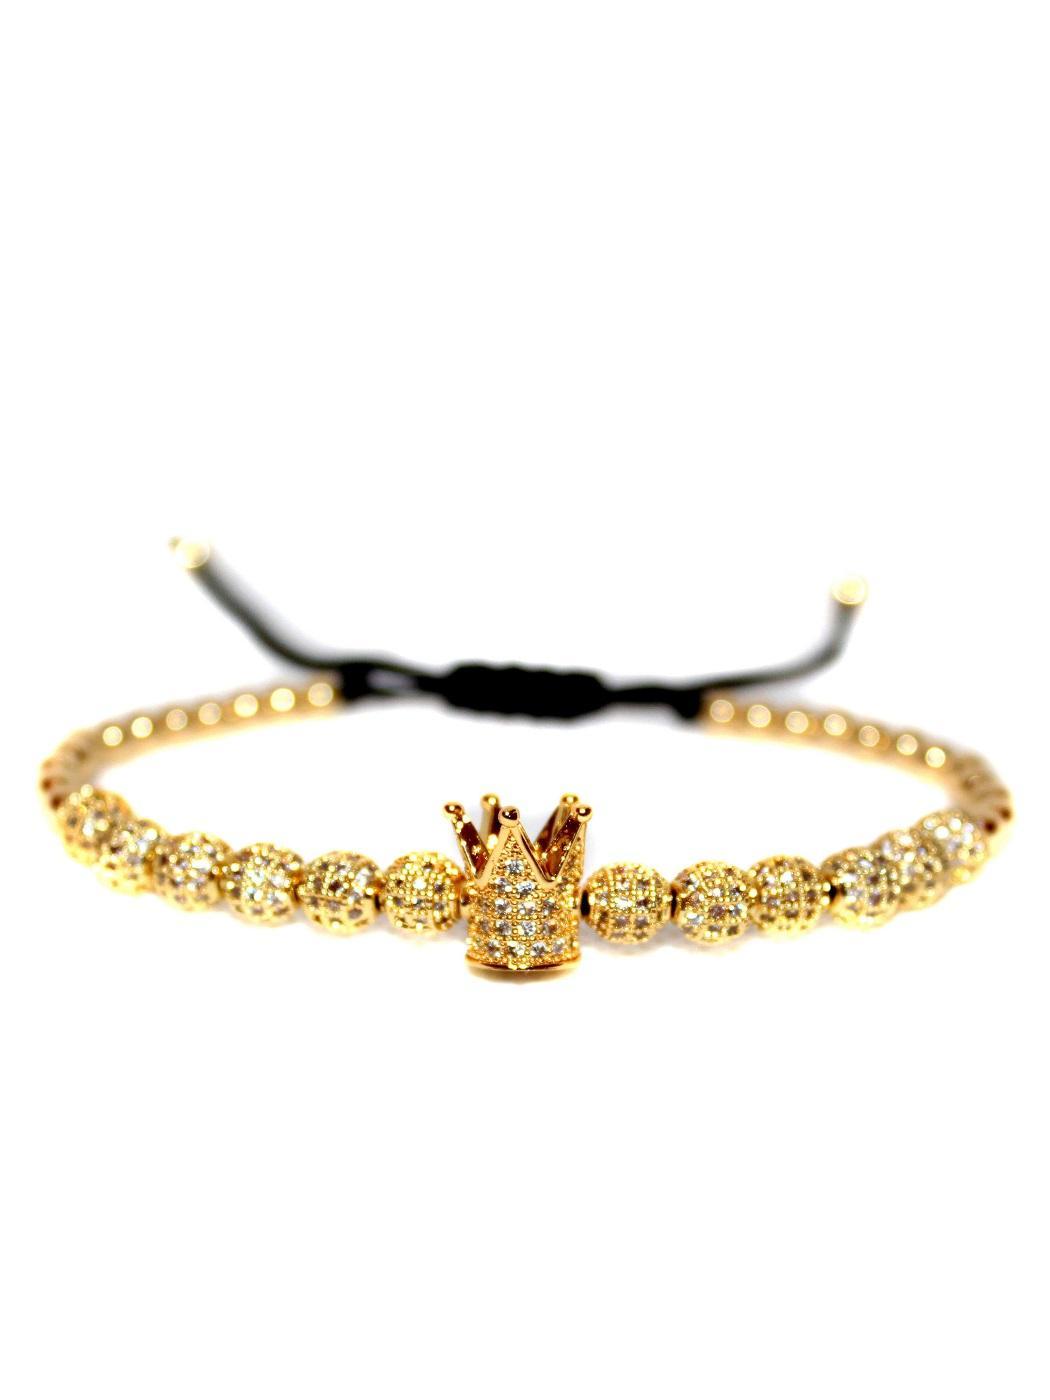 Fashion Jewelry Bracelets, Cool Bracelets With Meaning, Bracelet That You Can Add Charms To, Bangle Charm Bracelet Sets, Kings Beads, Guys Wearing Bracelets, Metal Charm Bracelets, Unique Charm Bracelet, Cheap Diamond Tennis Bracelet, Mens Crown Bracelet